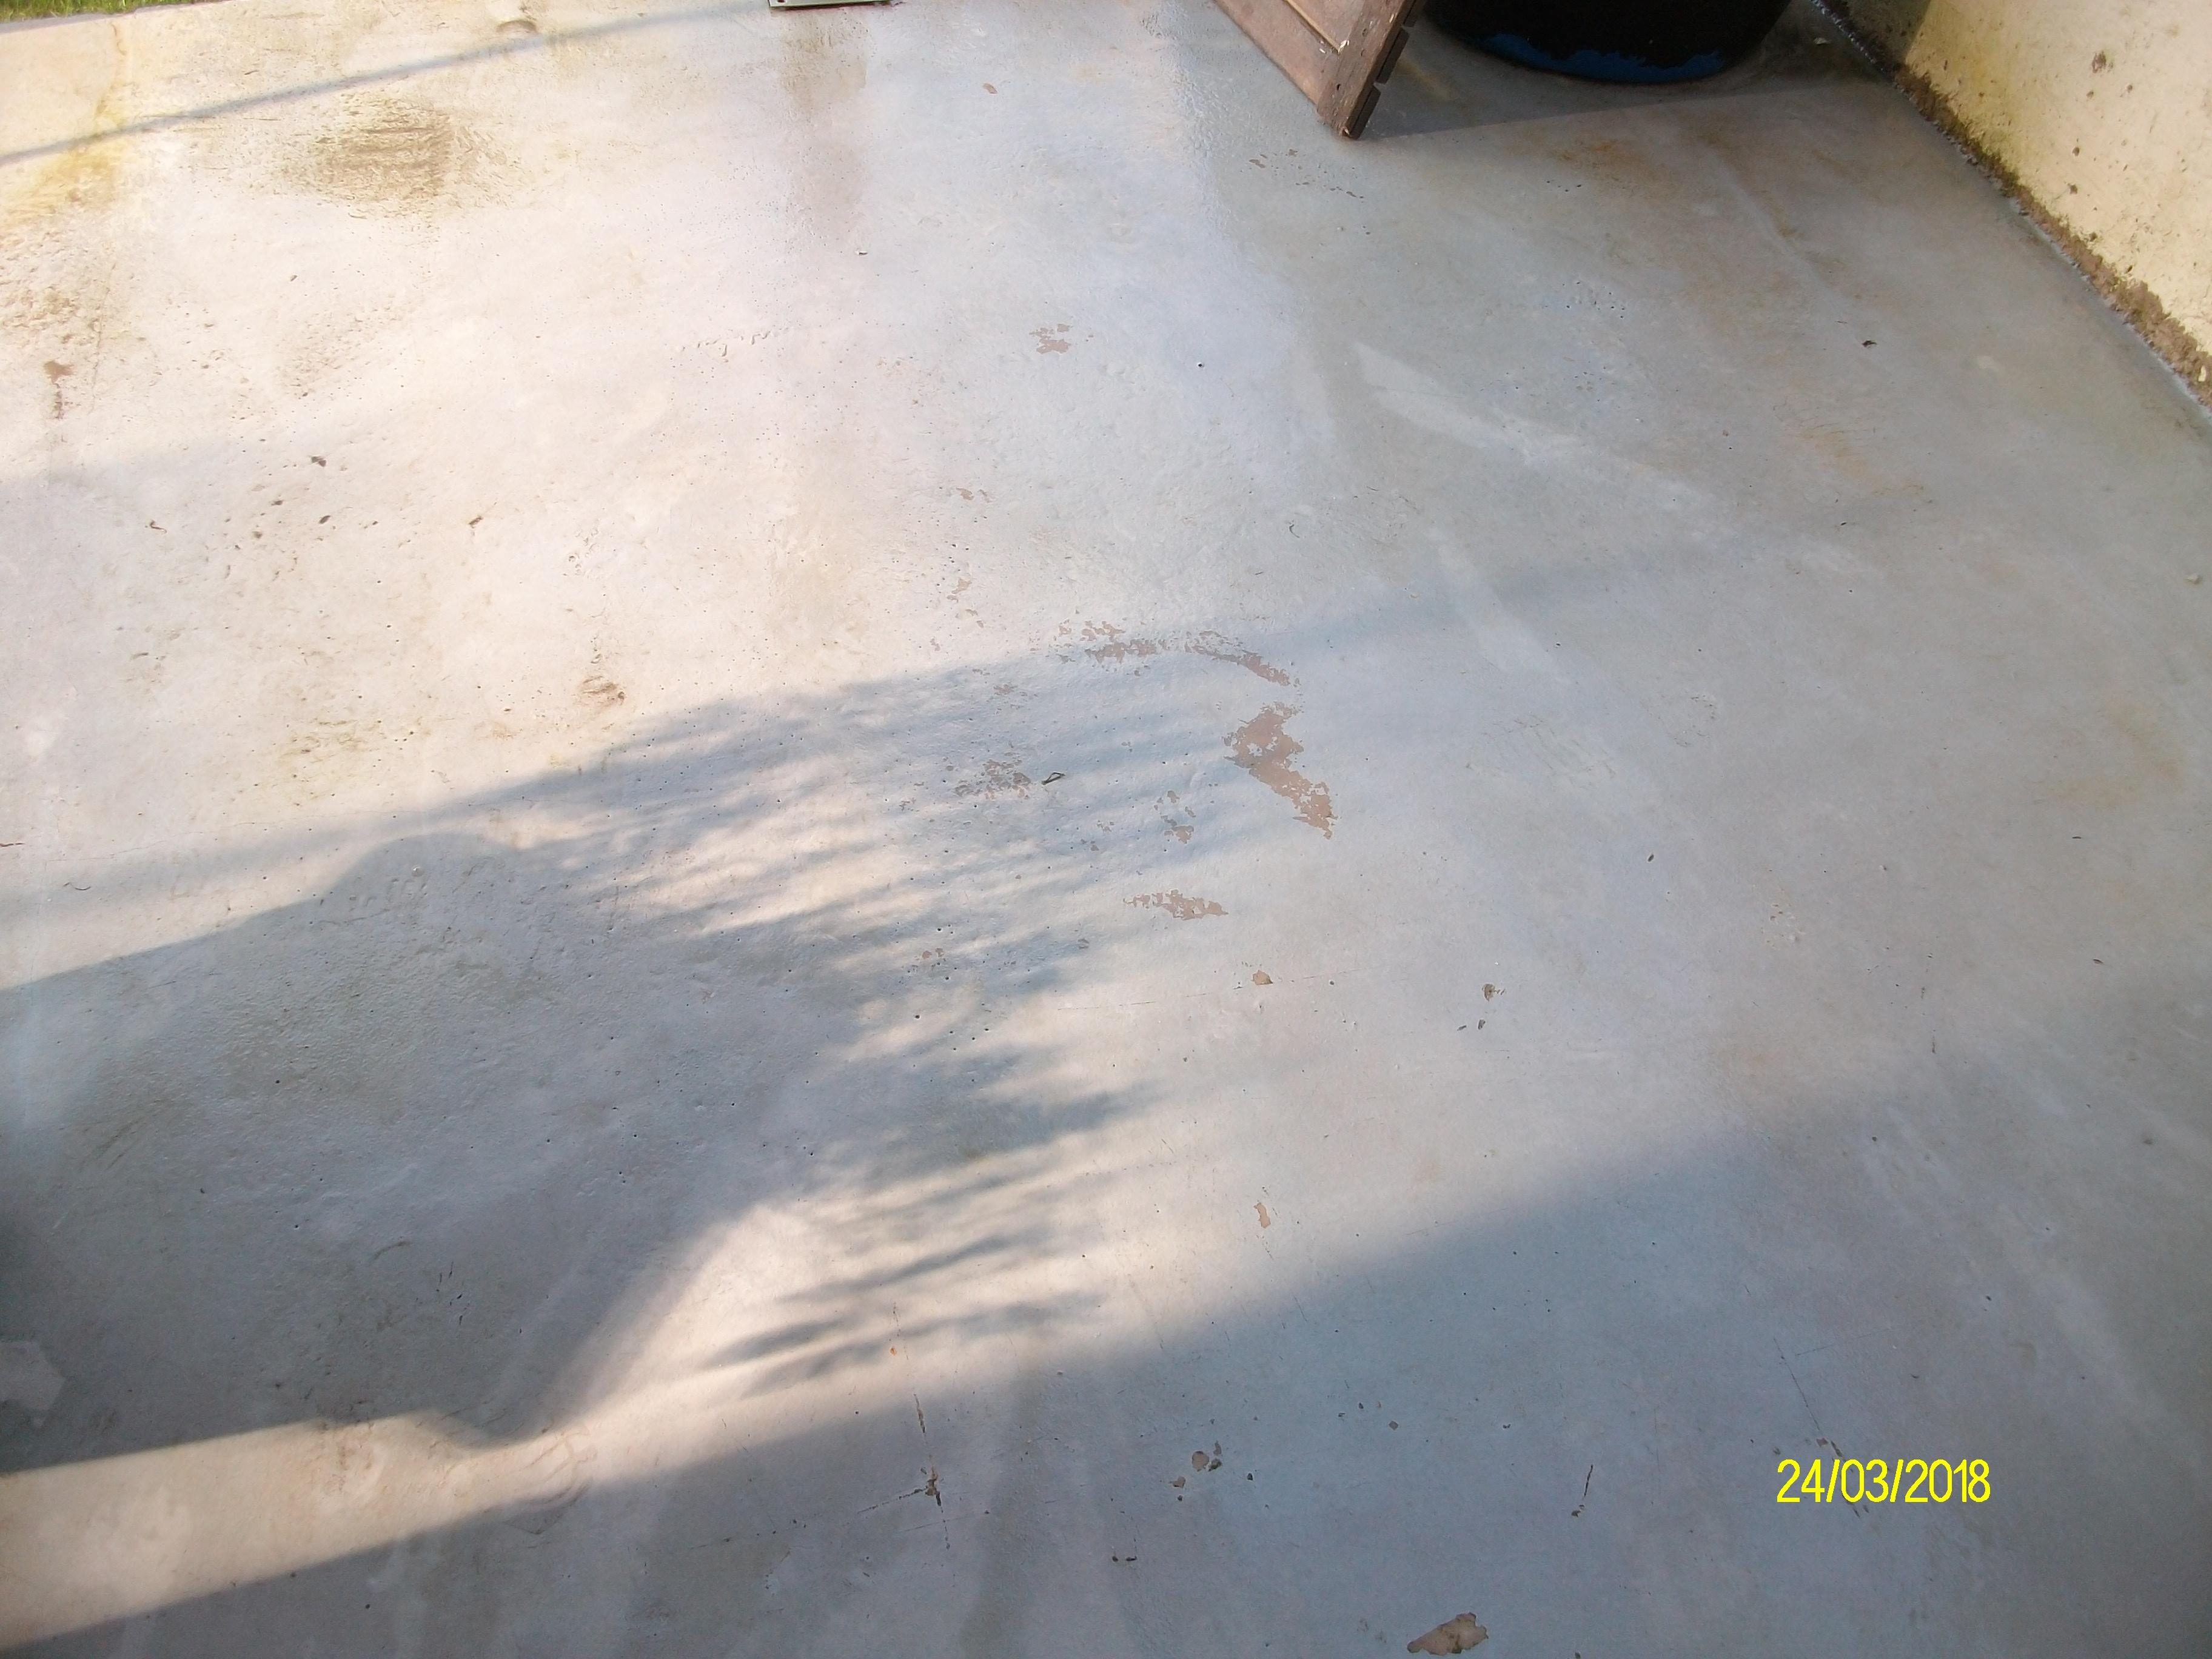 Nettoyer Sa Terrasse En Beton nettoyer de la mousse verte sur une terrasse en béton